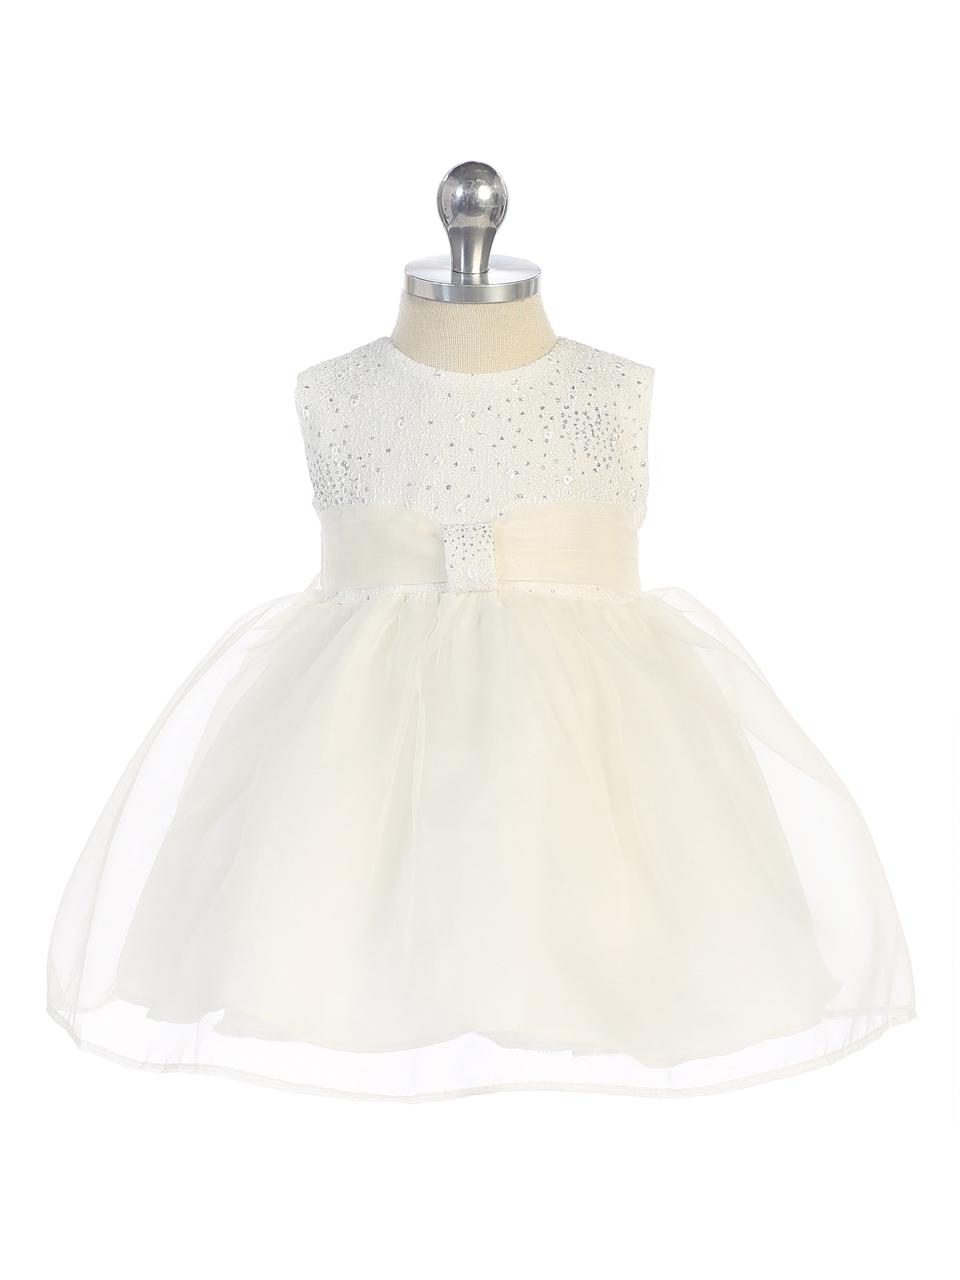 Baby Sparkle Bodice Dress, White & Ivory